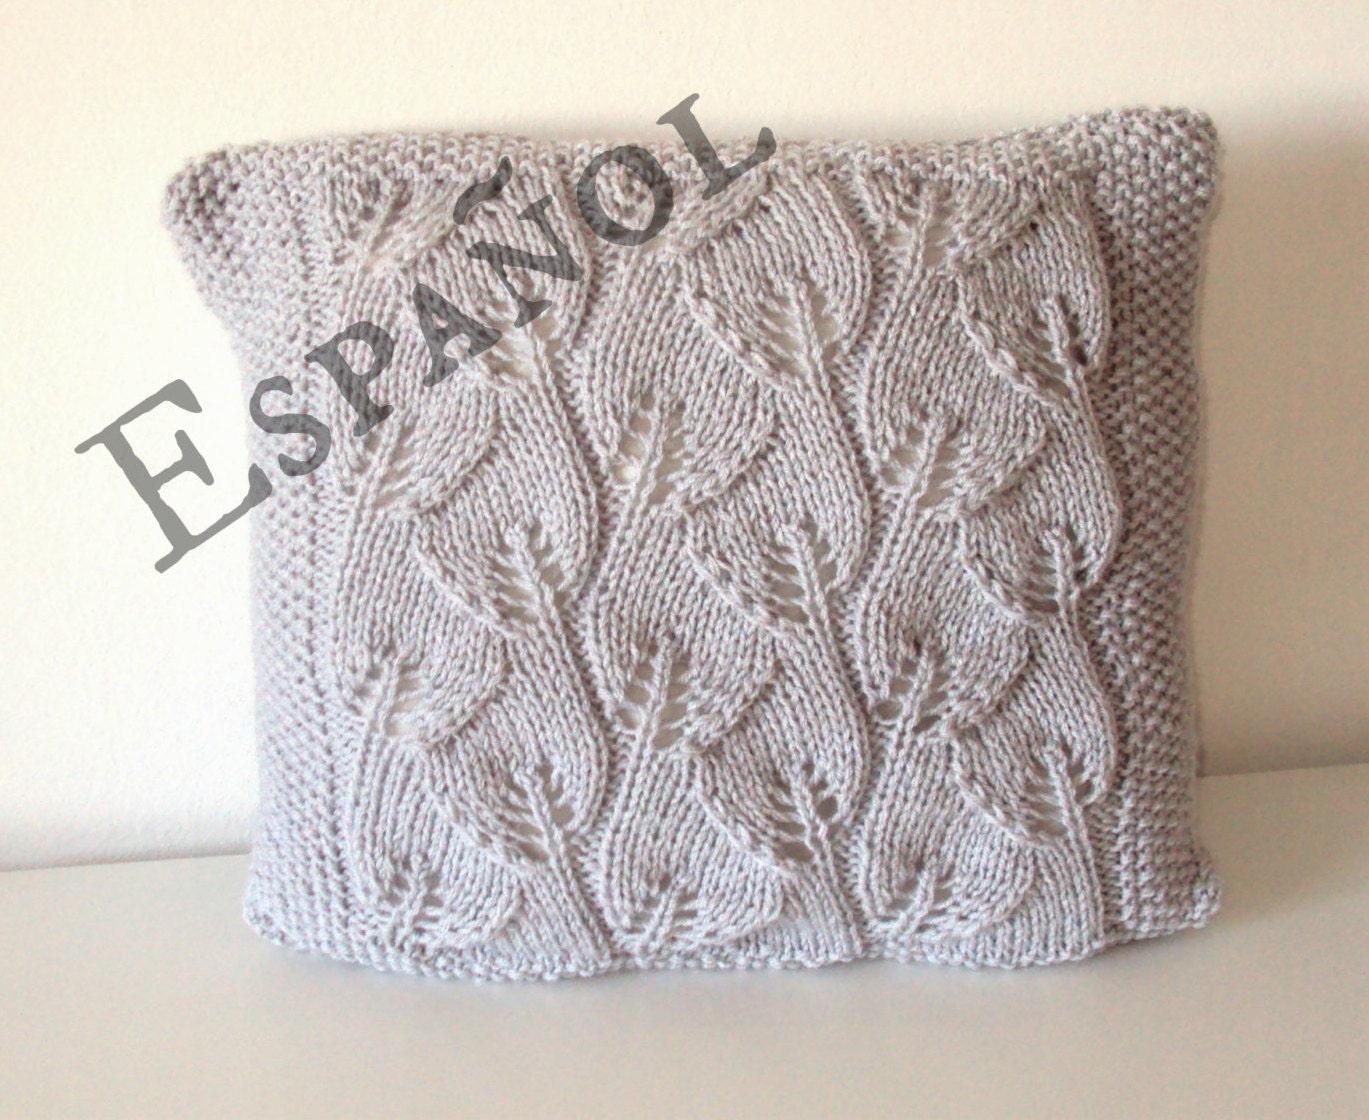 PATRÓN Almohadón hojas tejido patrón almohadón tejido patrón | Etsy